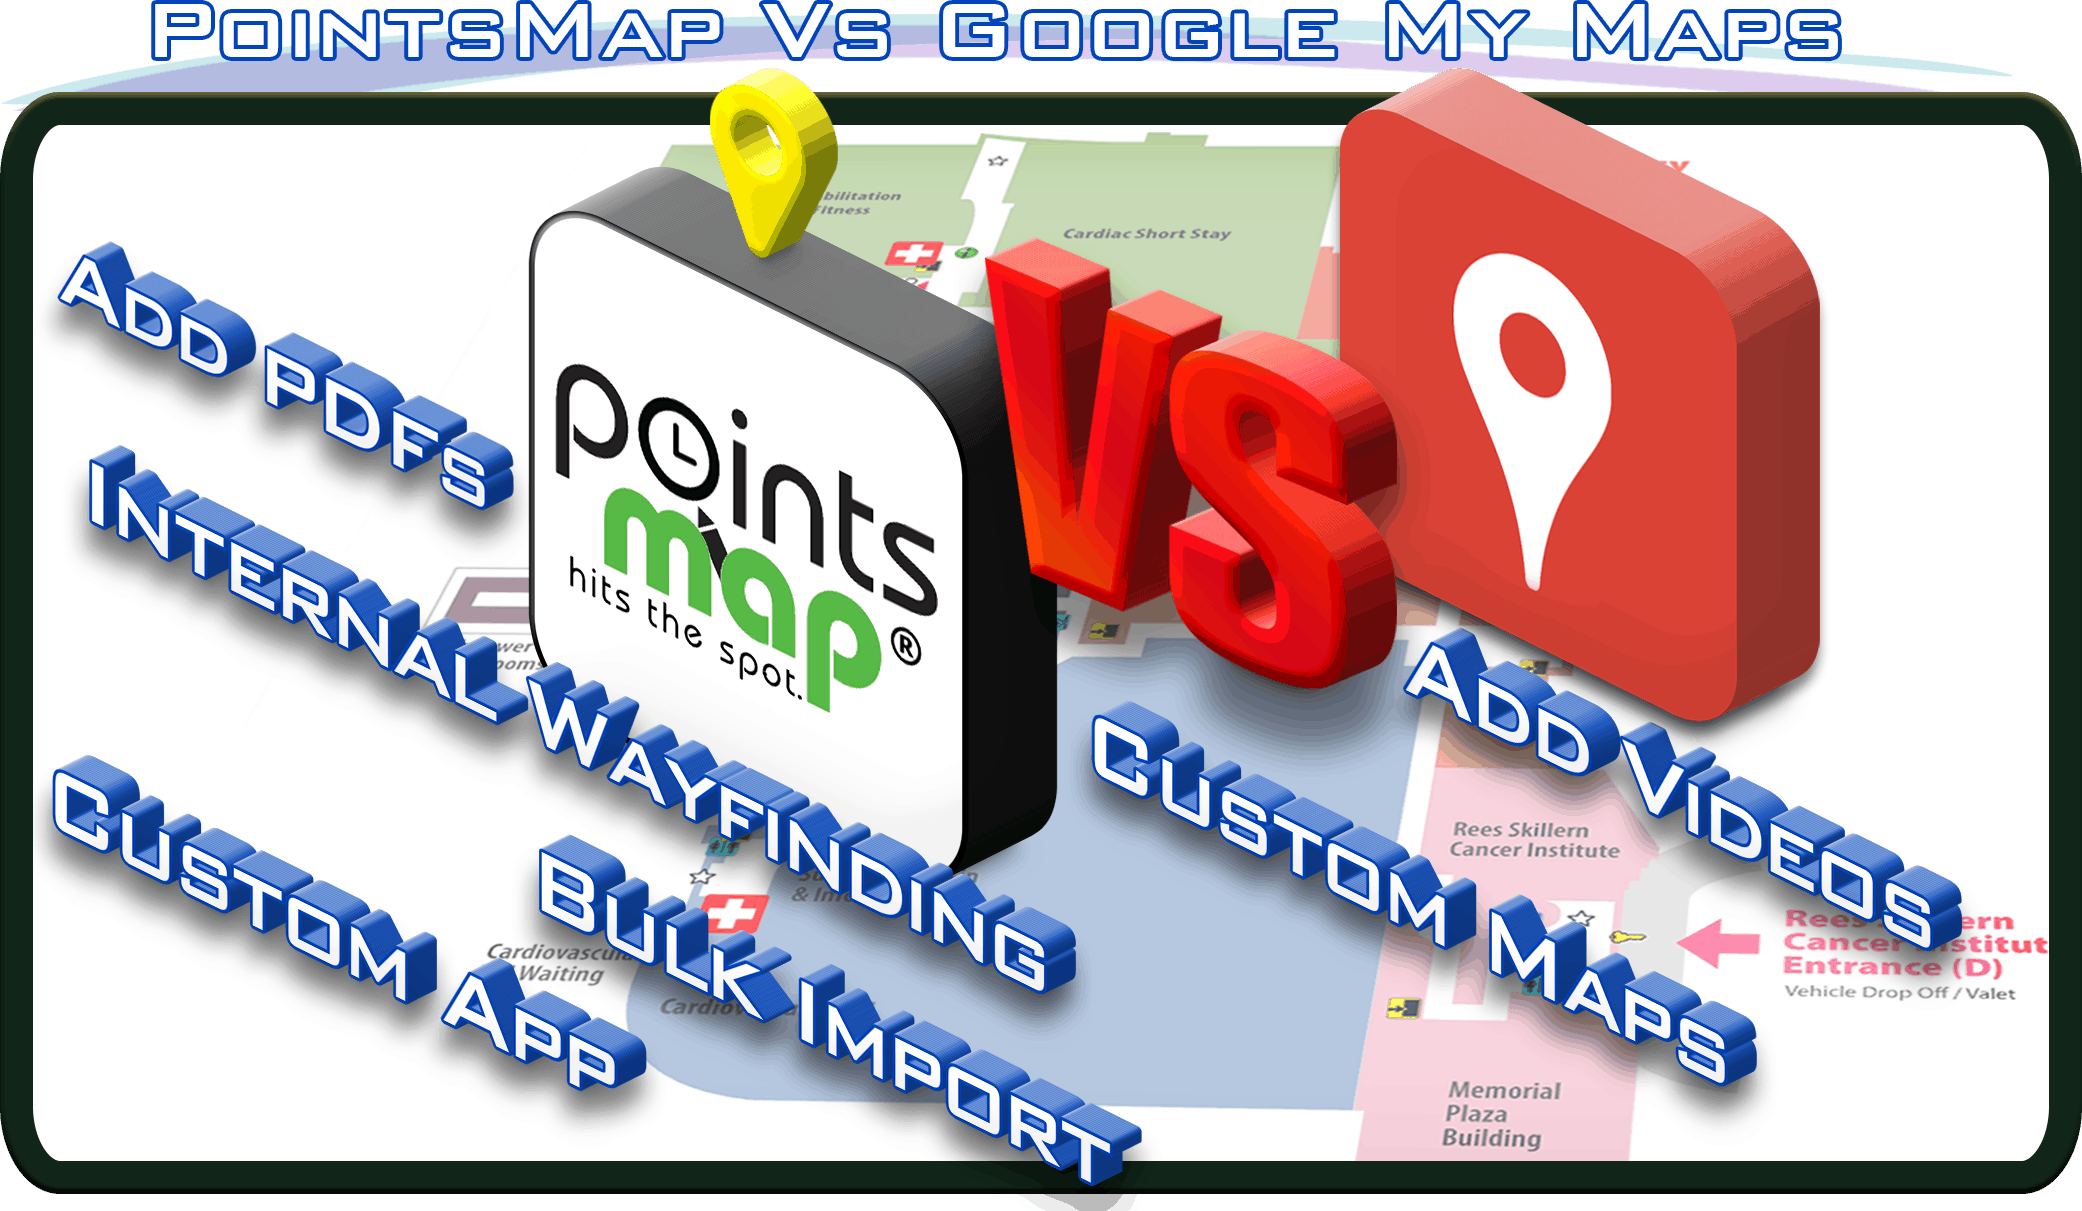 pm_vs-google2